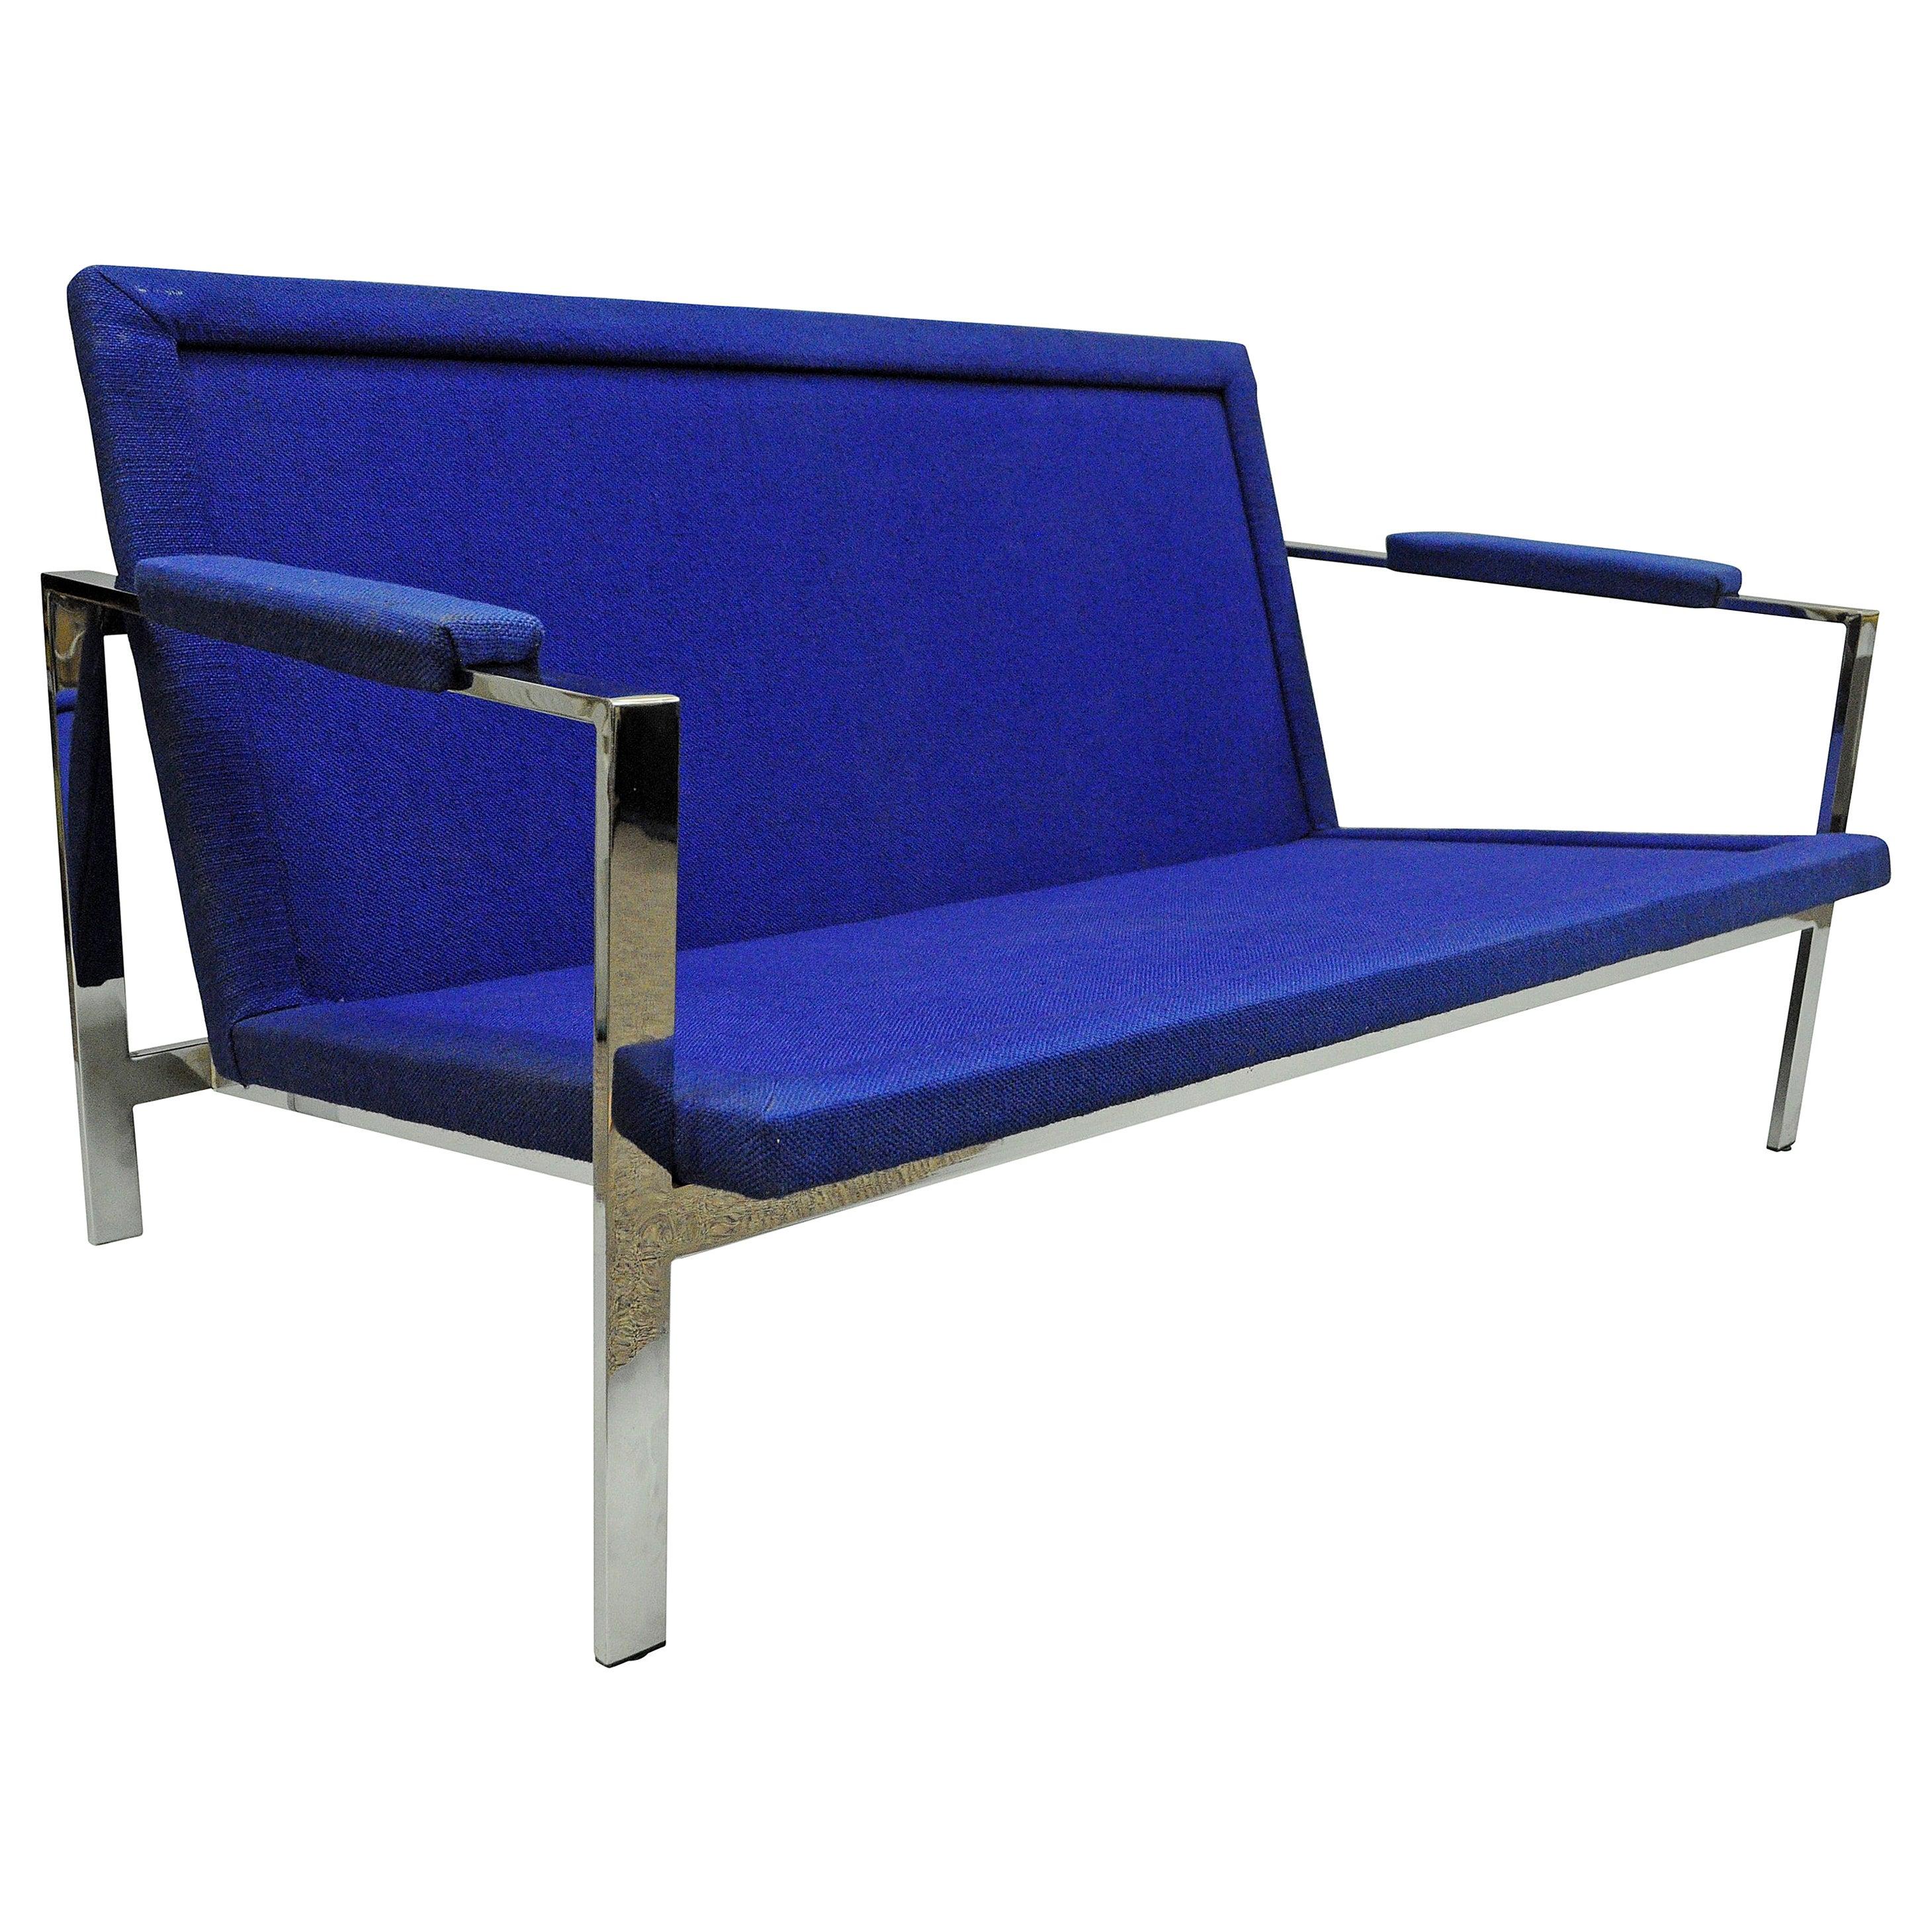 Mid-Century Modern Milo Baughman Style Chrome Flat Bar Settee Loveseat Sofa